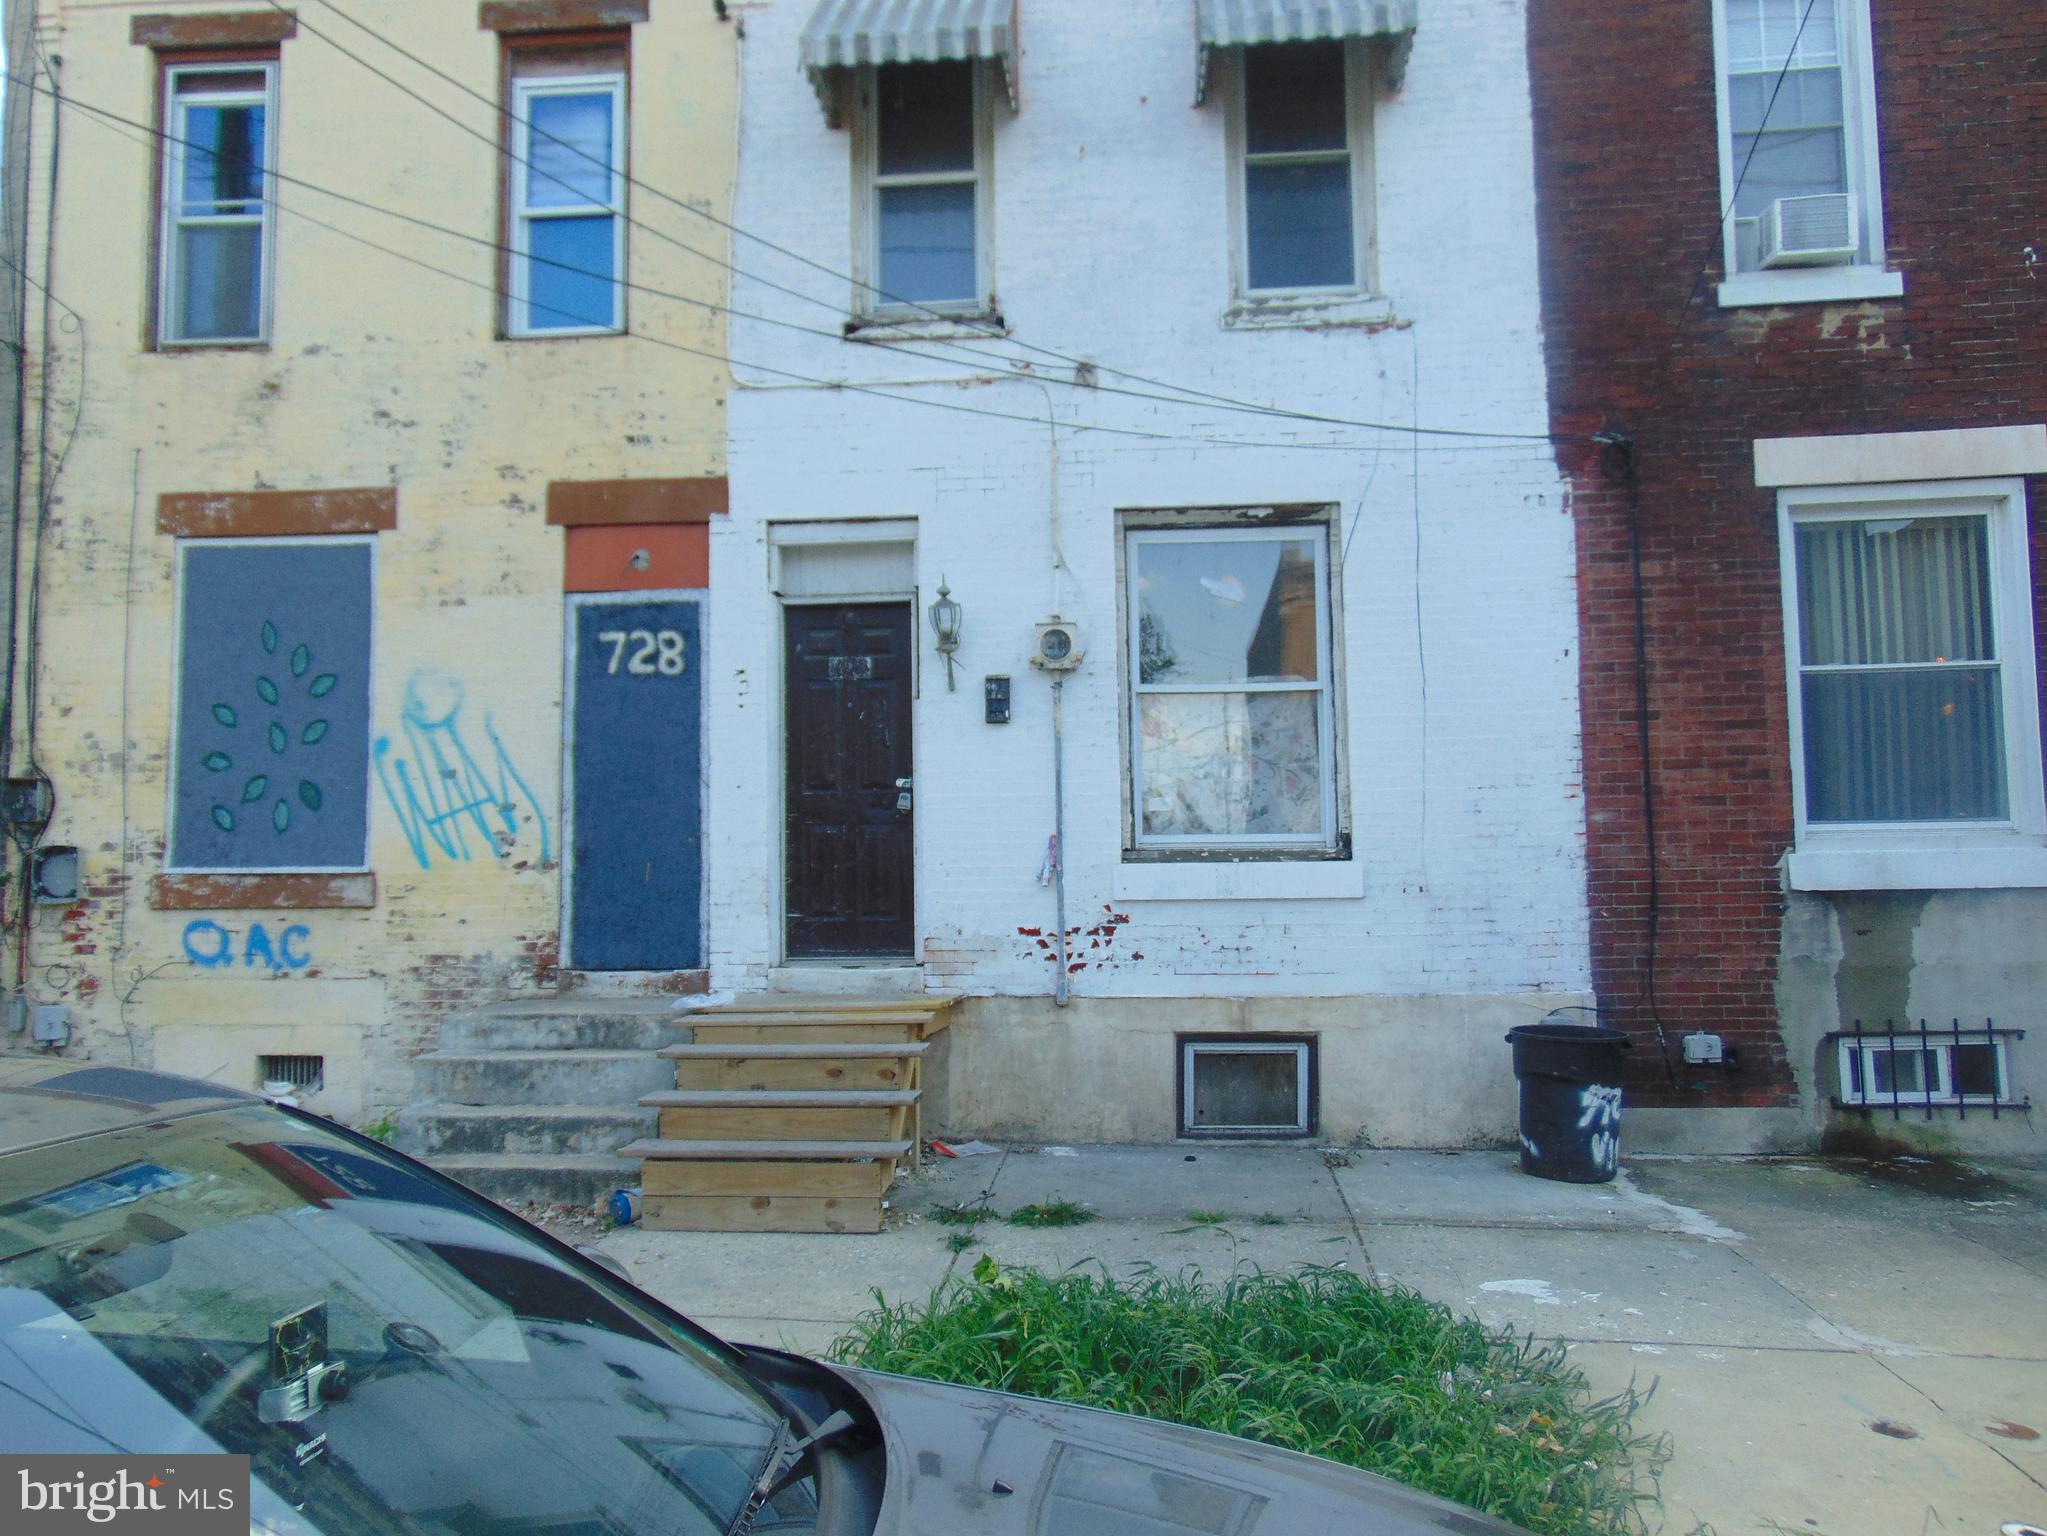 726 VINE STREET, CAMDEN, NJ 08102